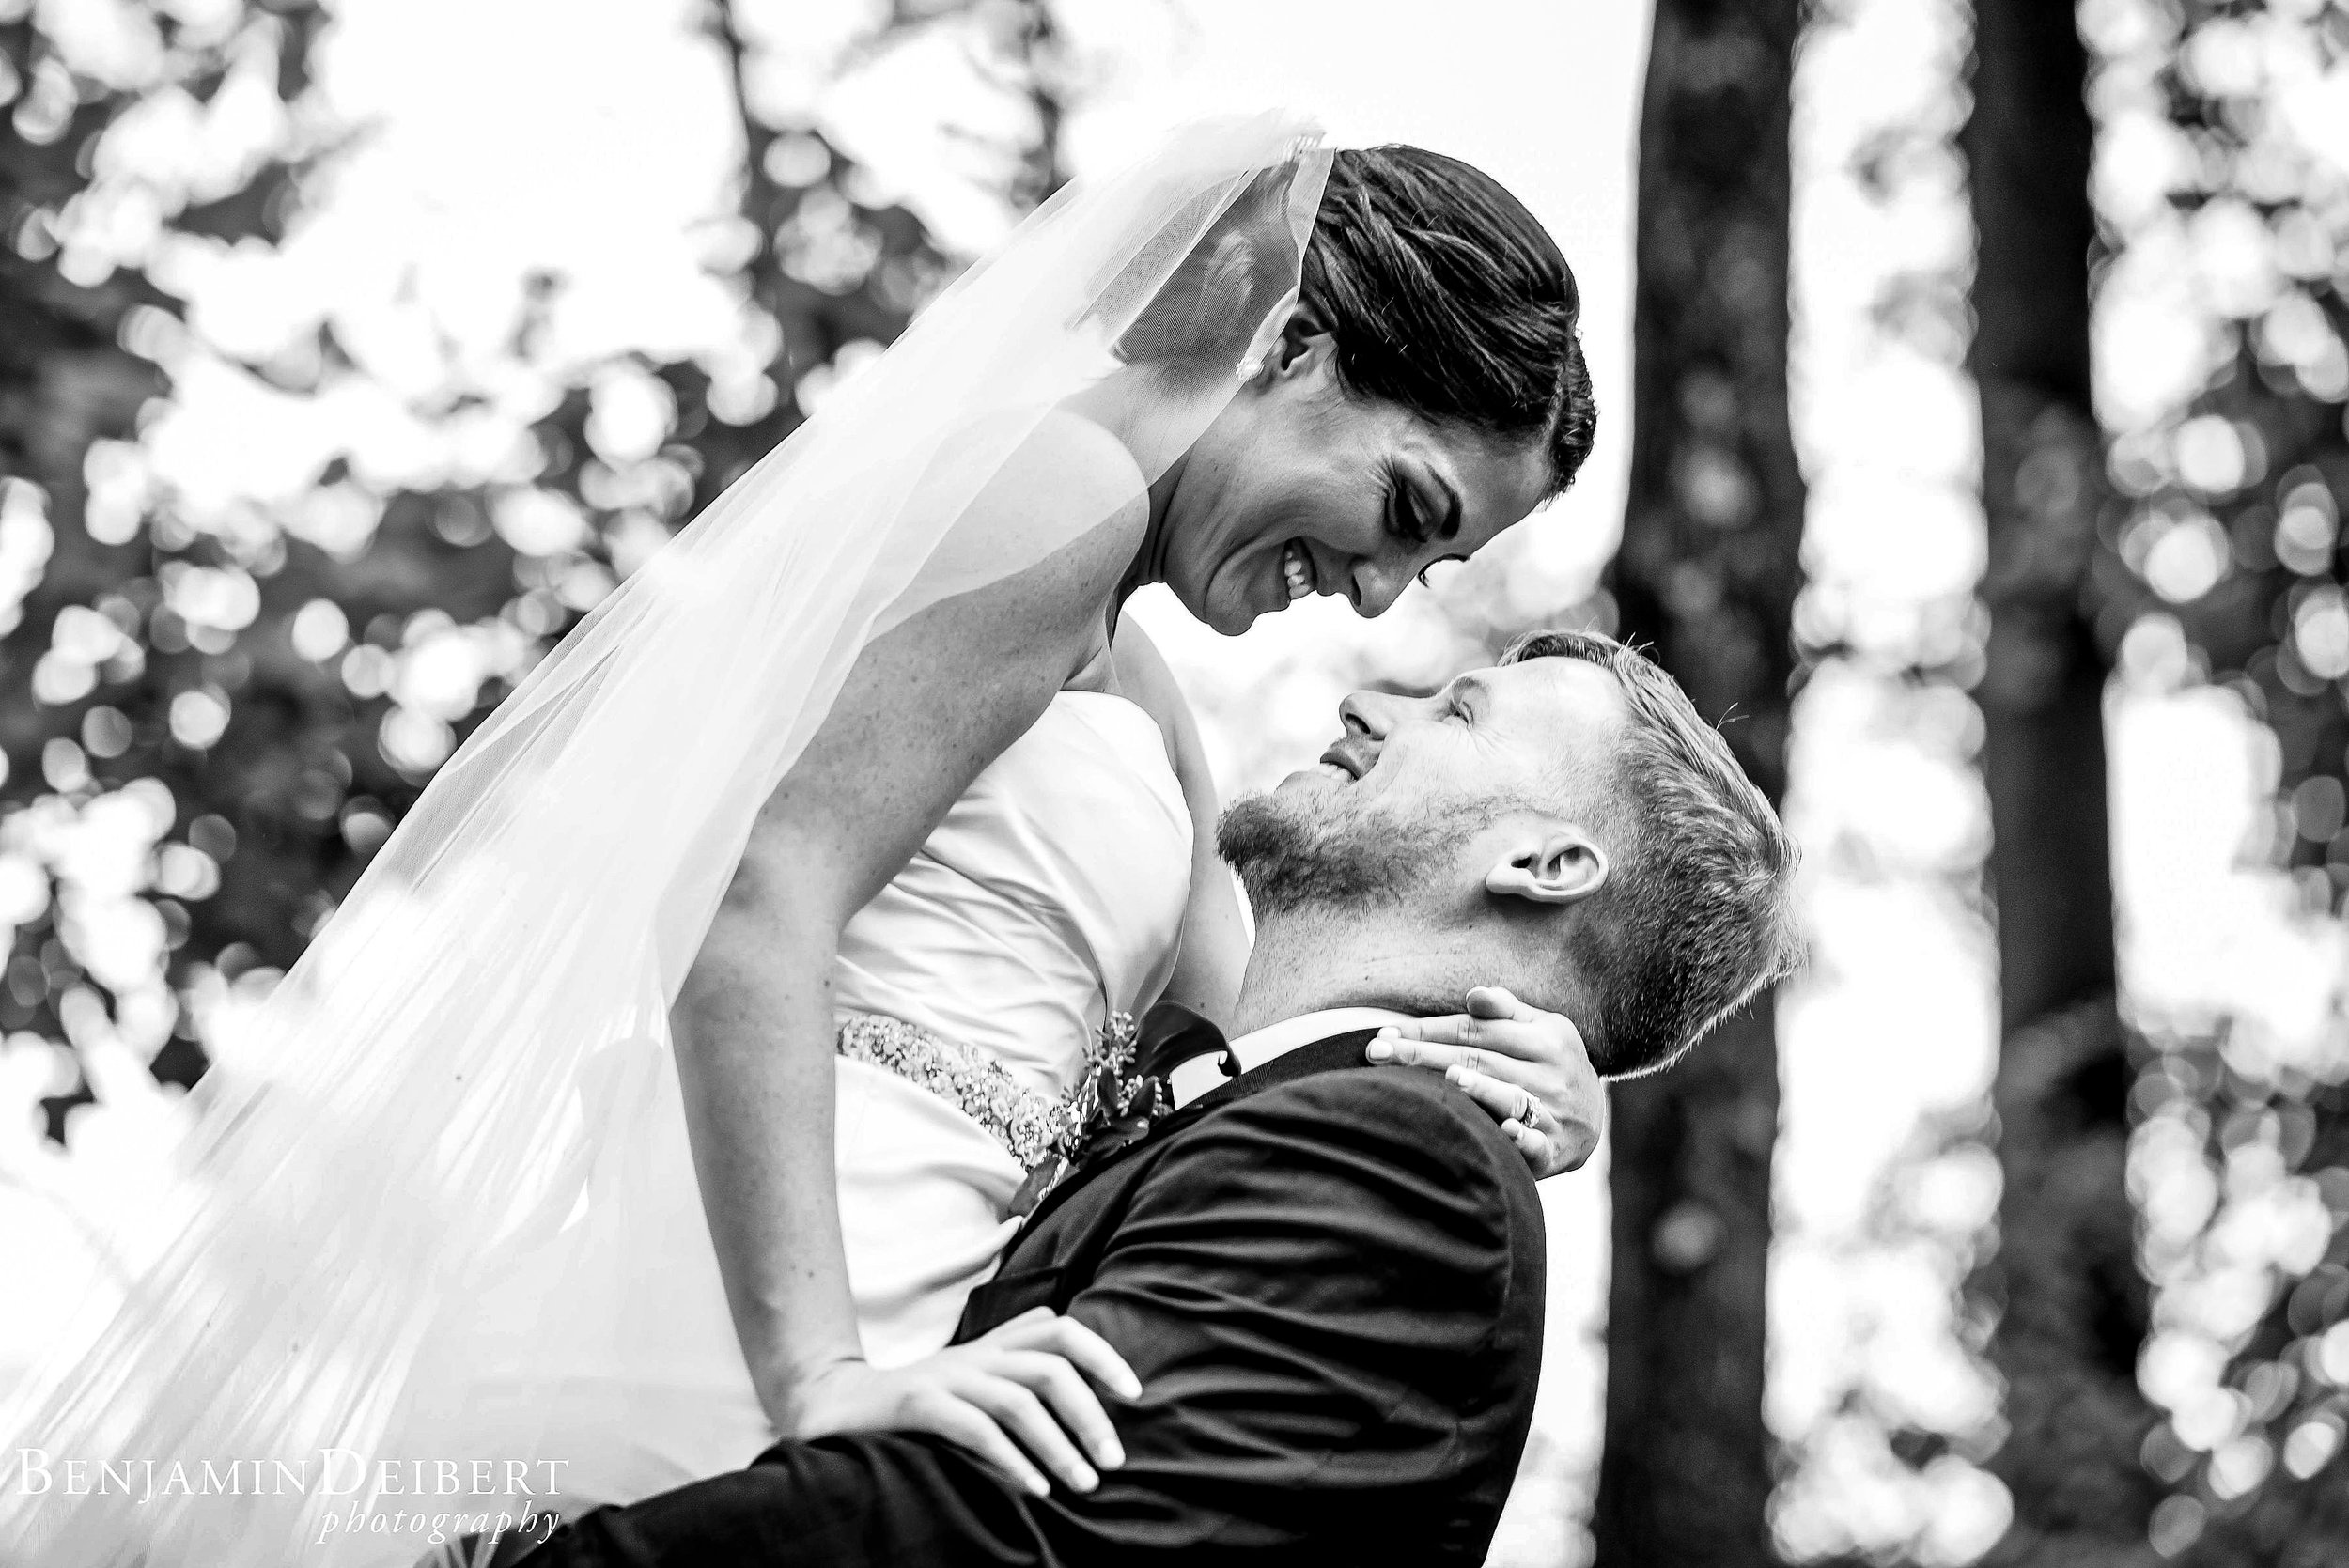 TeghanandChris_BridgemensBallroom_Wedding-74.jpg